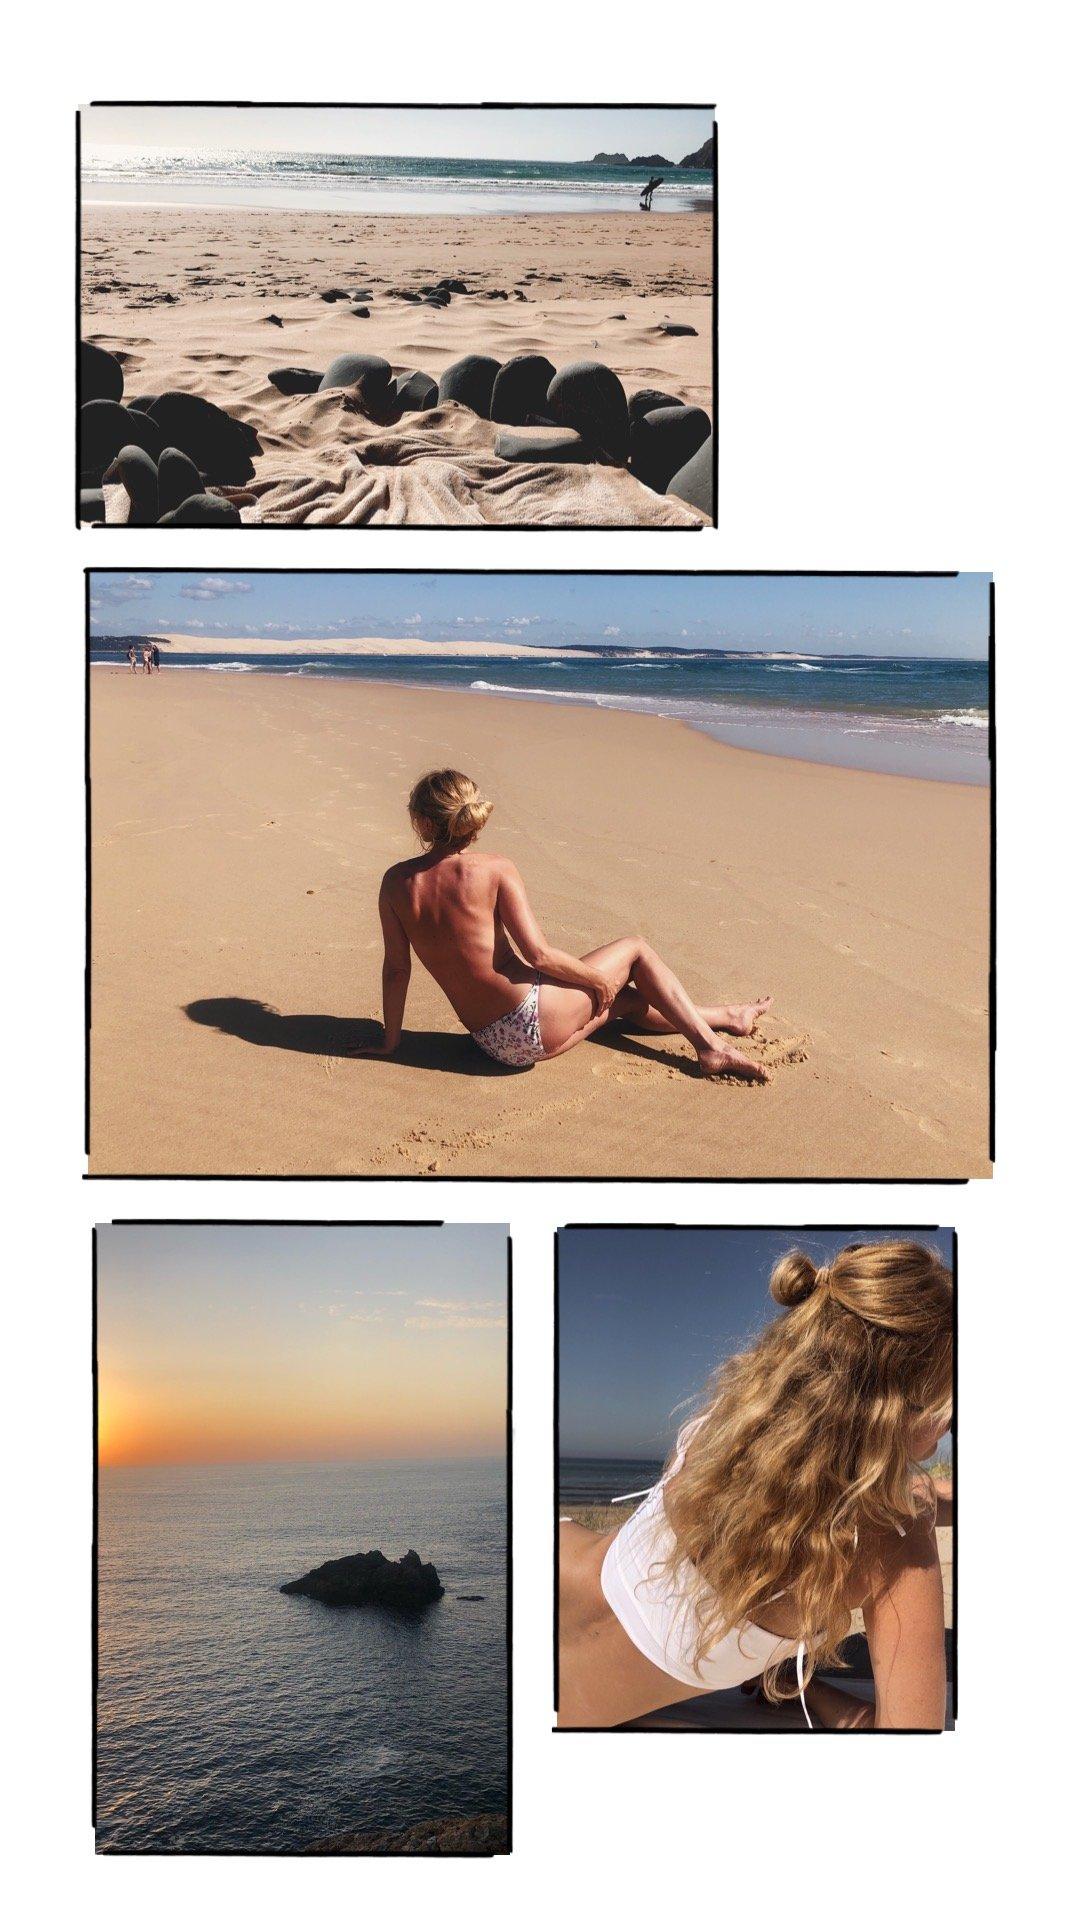 Sommer-Urlaub-Koffer-packen-Nowshine-ü40-Mode-Blog-